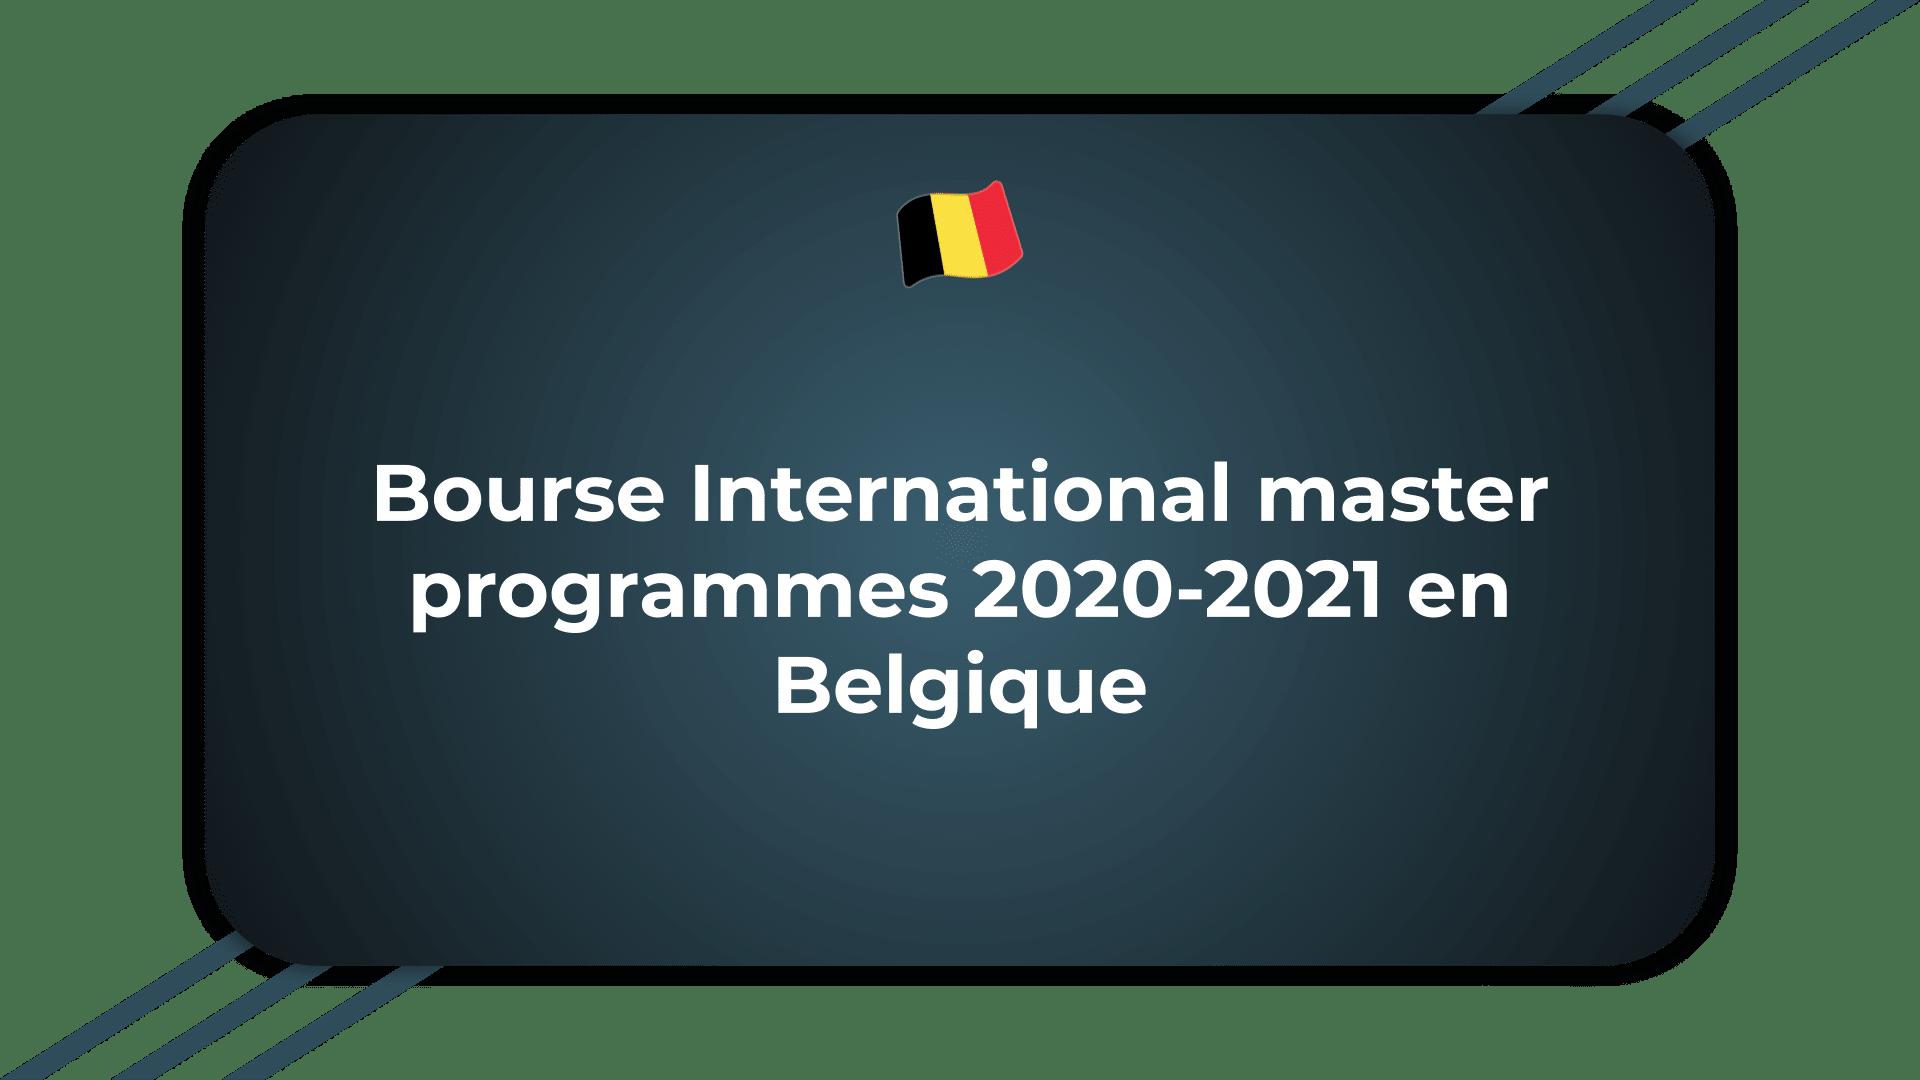 Bourse International master programmes